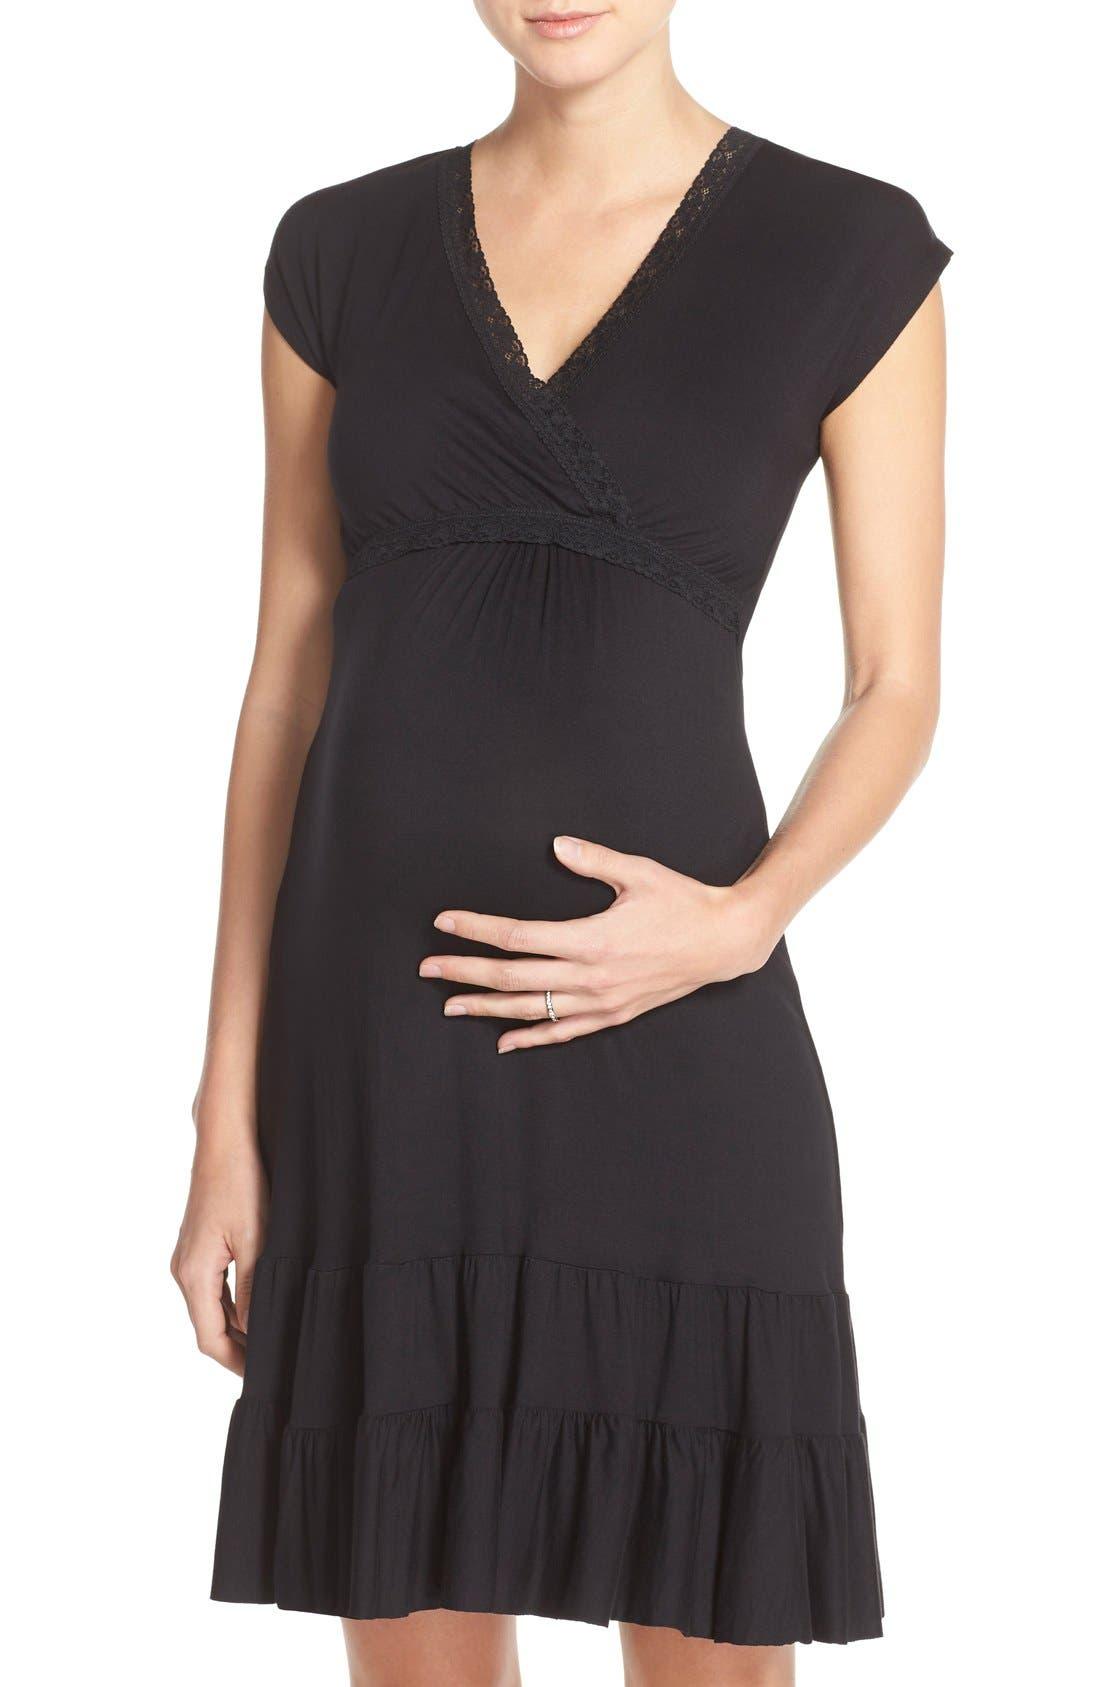 Ruffle Nursing Dress,                         Main,                         color,